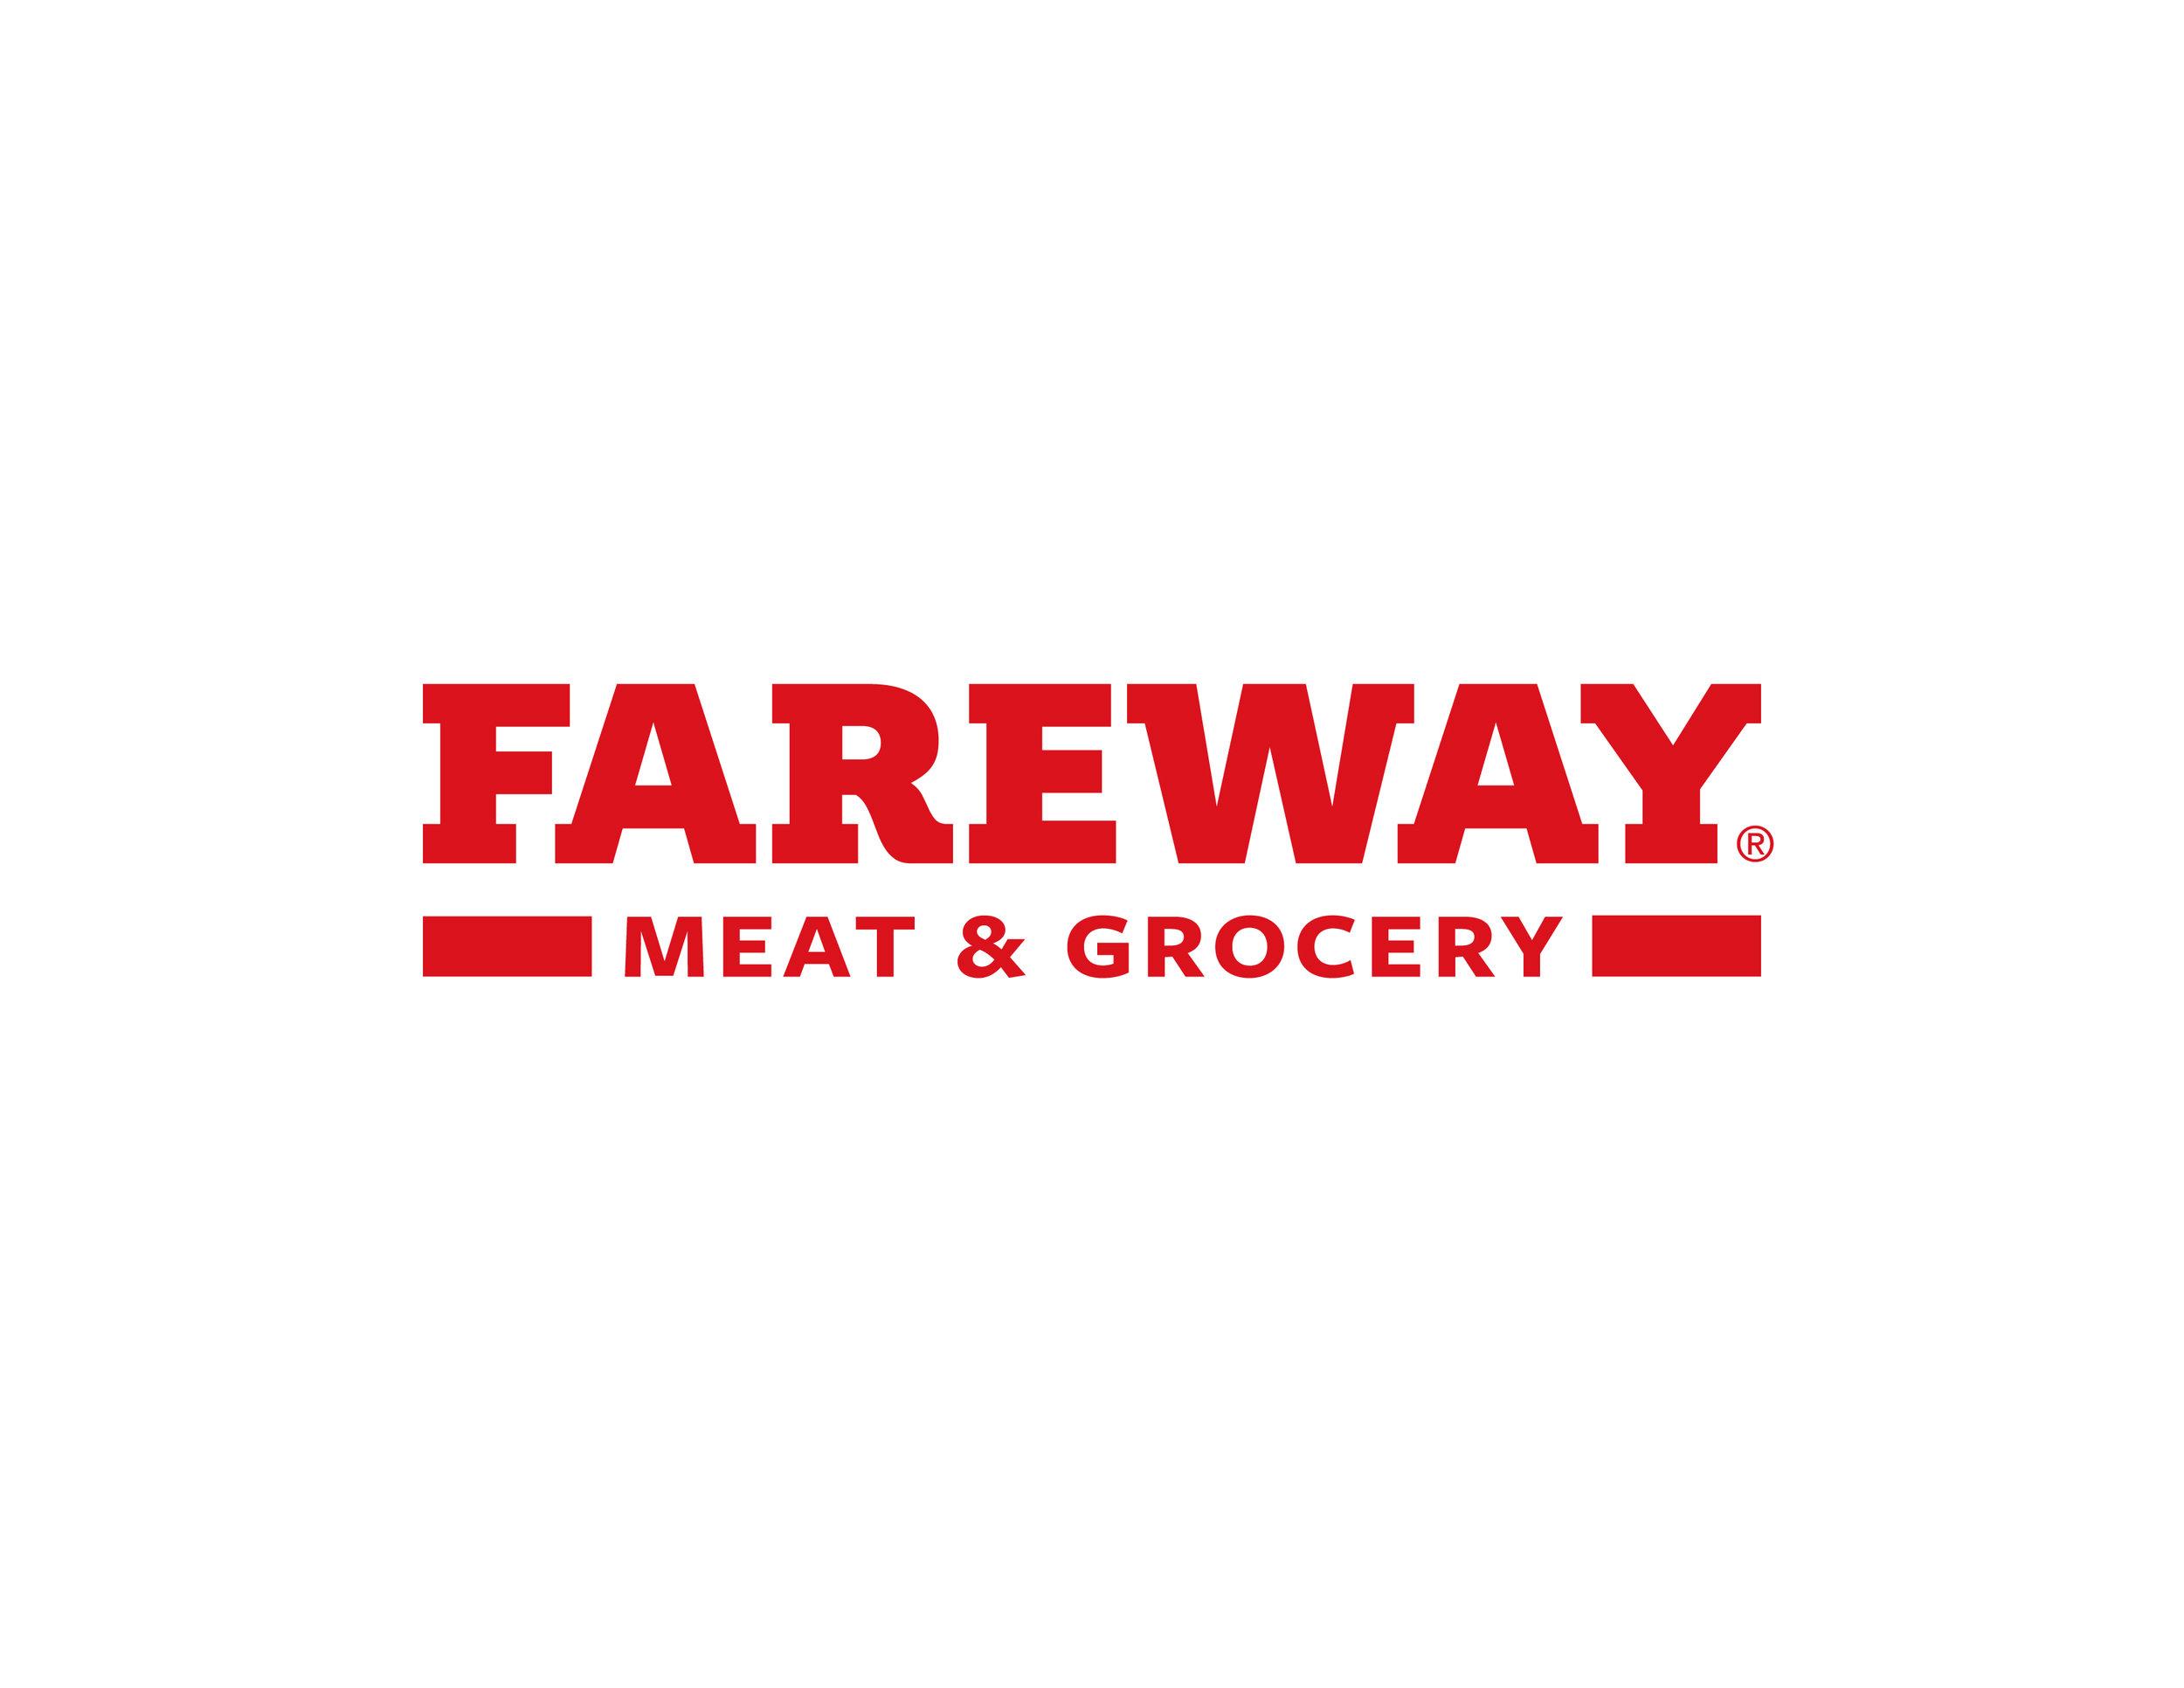 fareway-logo-1C.jpg